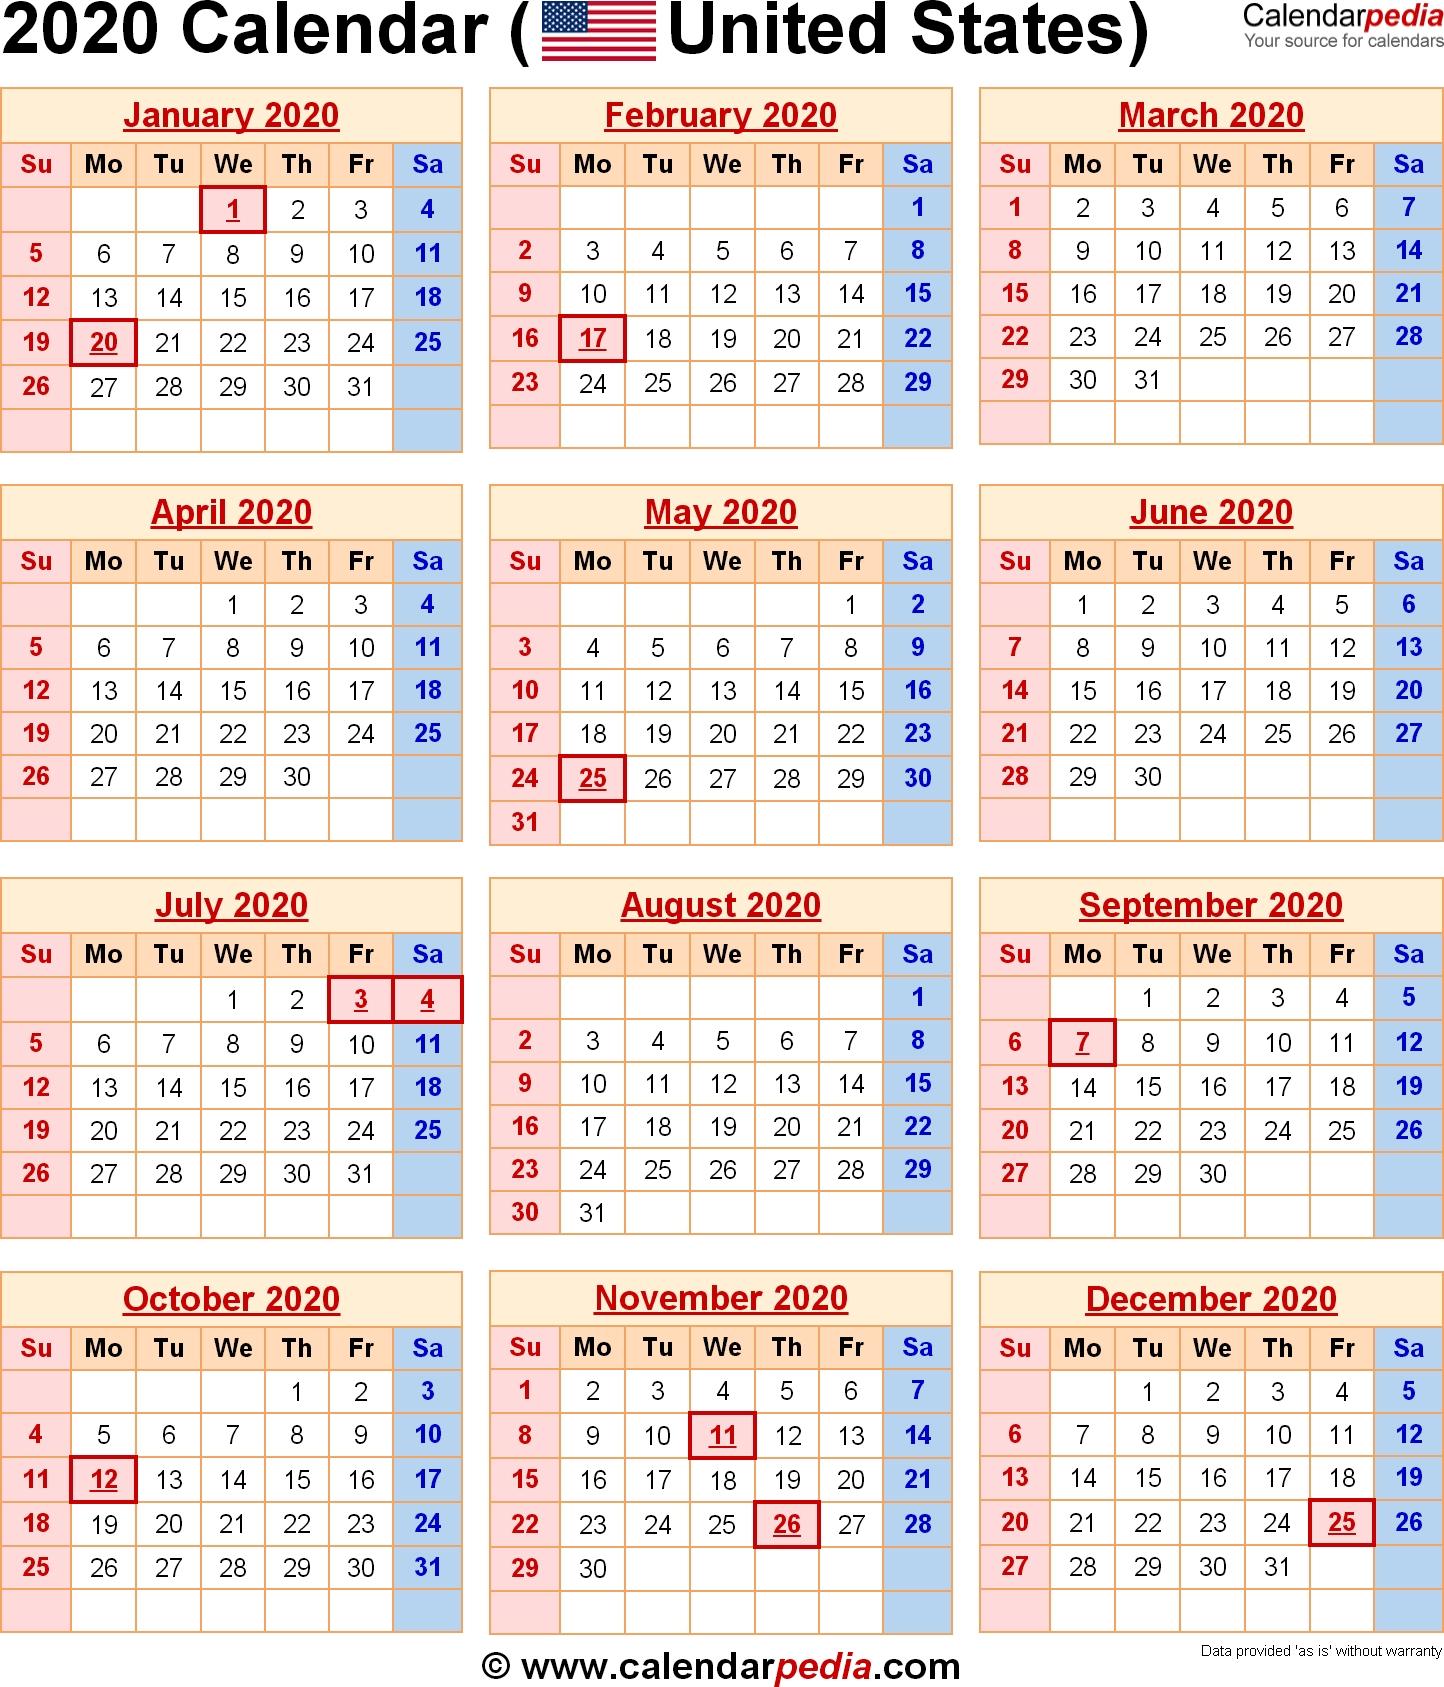 2020 Calendar With Federal Holidays Dashing Free Printable Christmas Calendar 2020